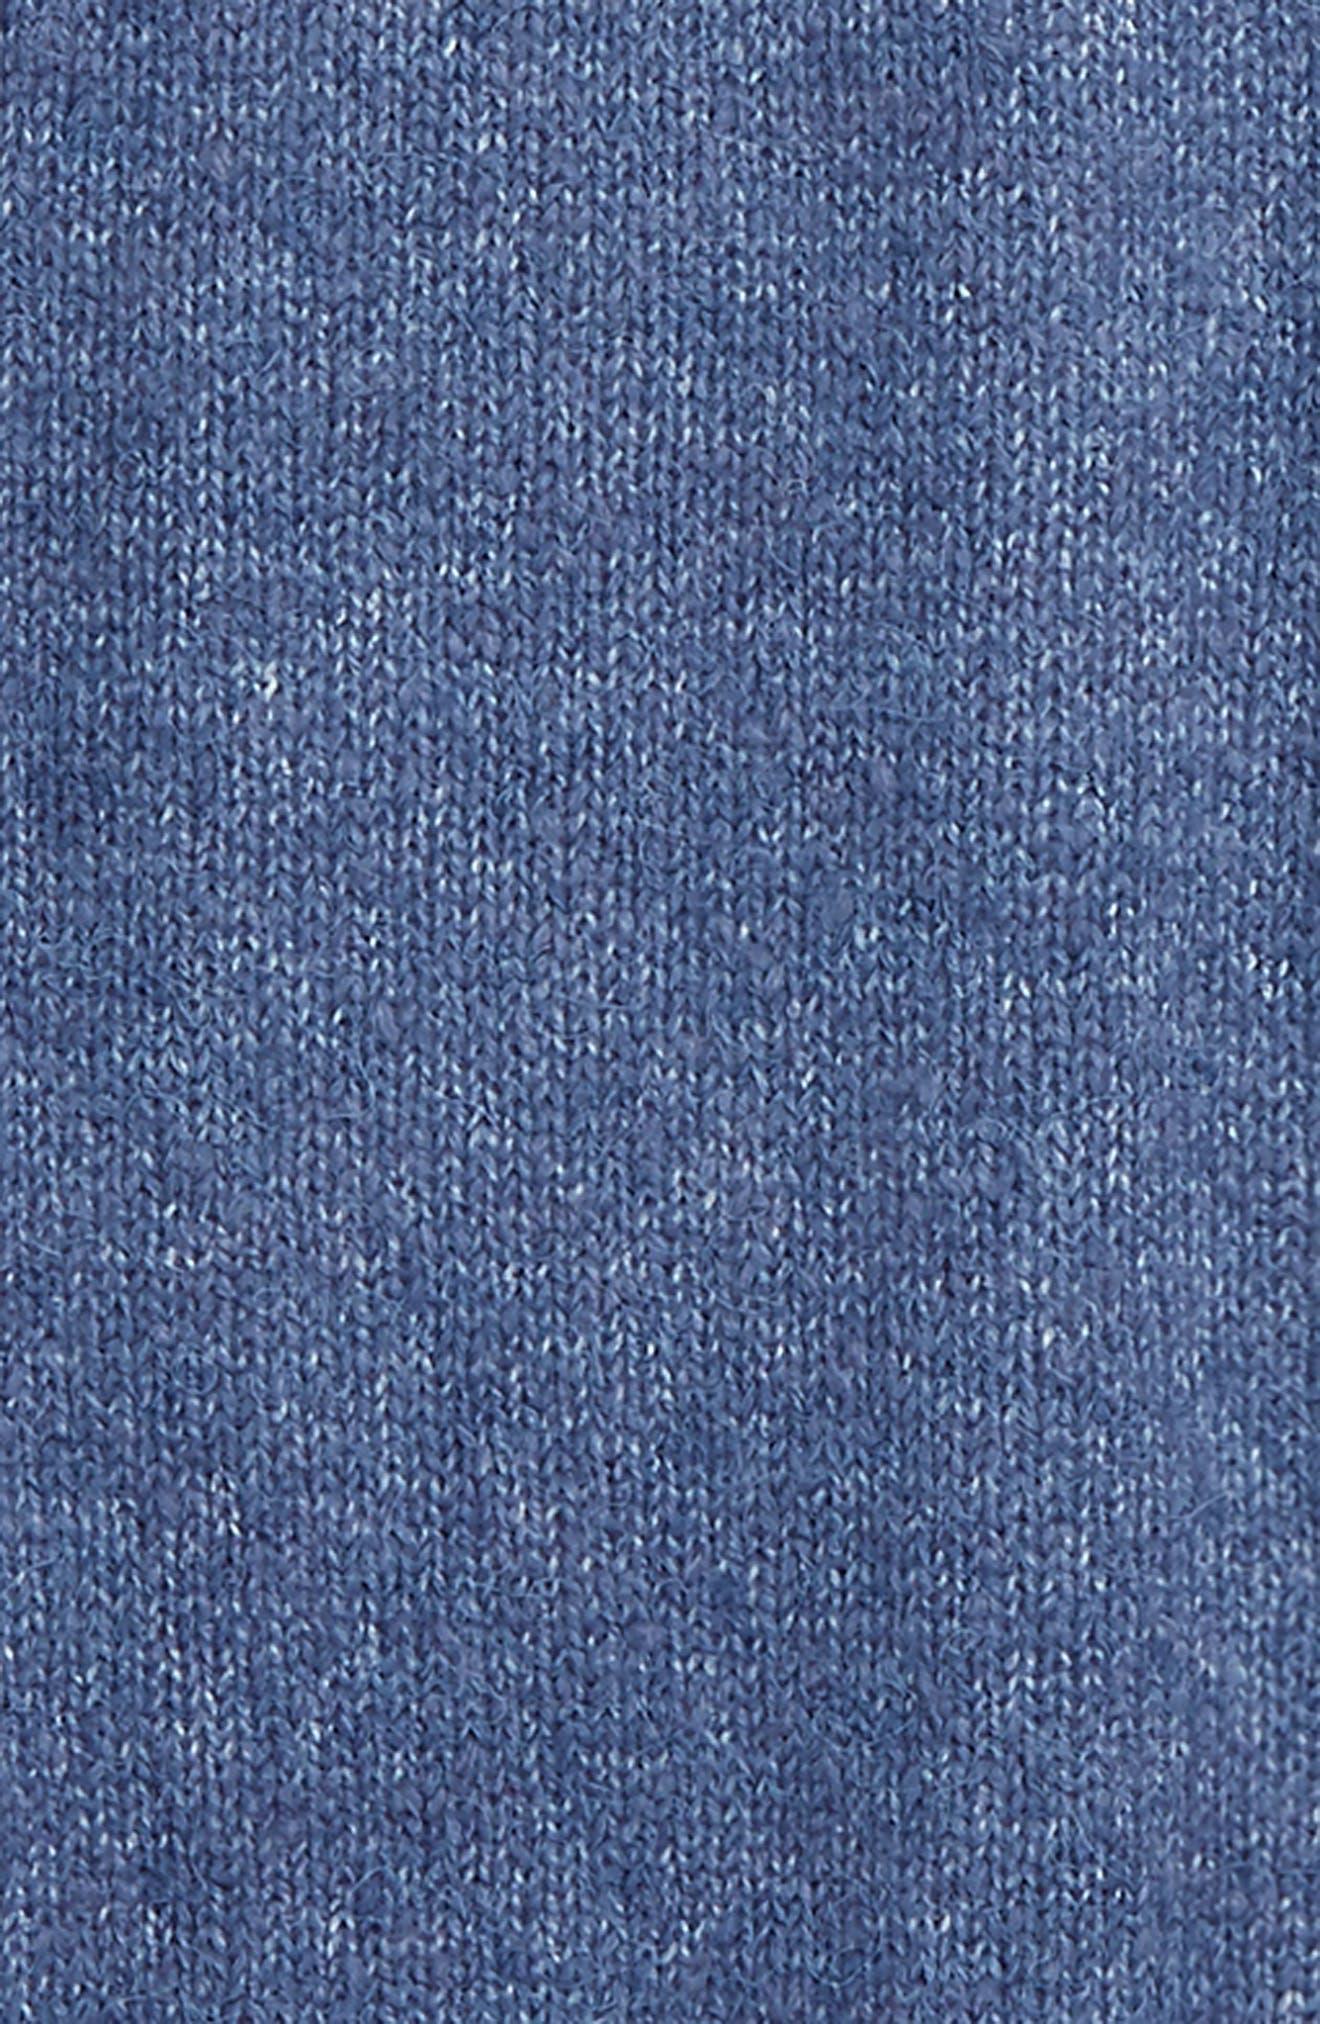 Colorblock Knit Sweater,                             Alternate thumbnail 2, color,                             420